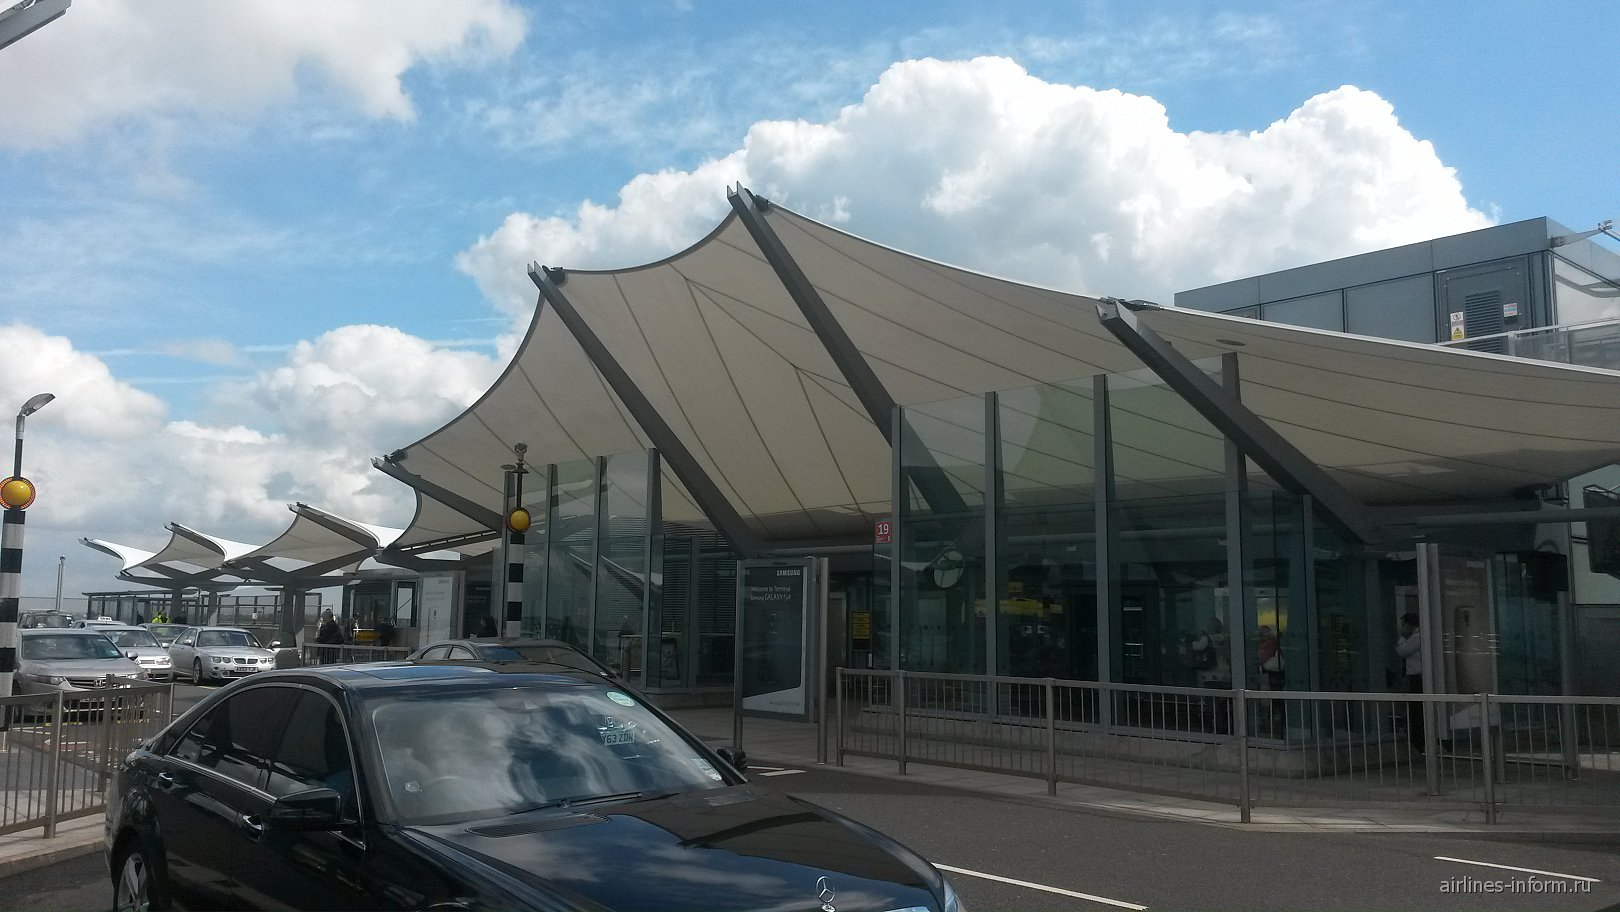 Вход в терминал 5 аэропорта Лондон Хитроу